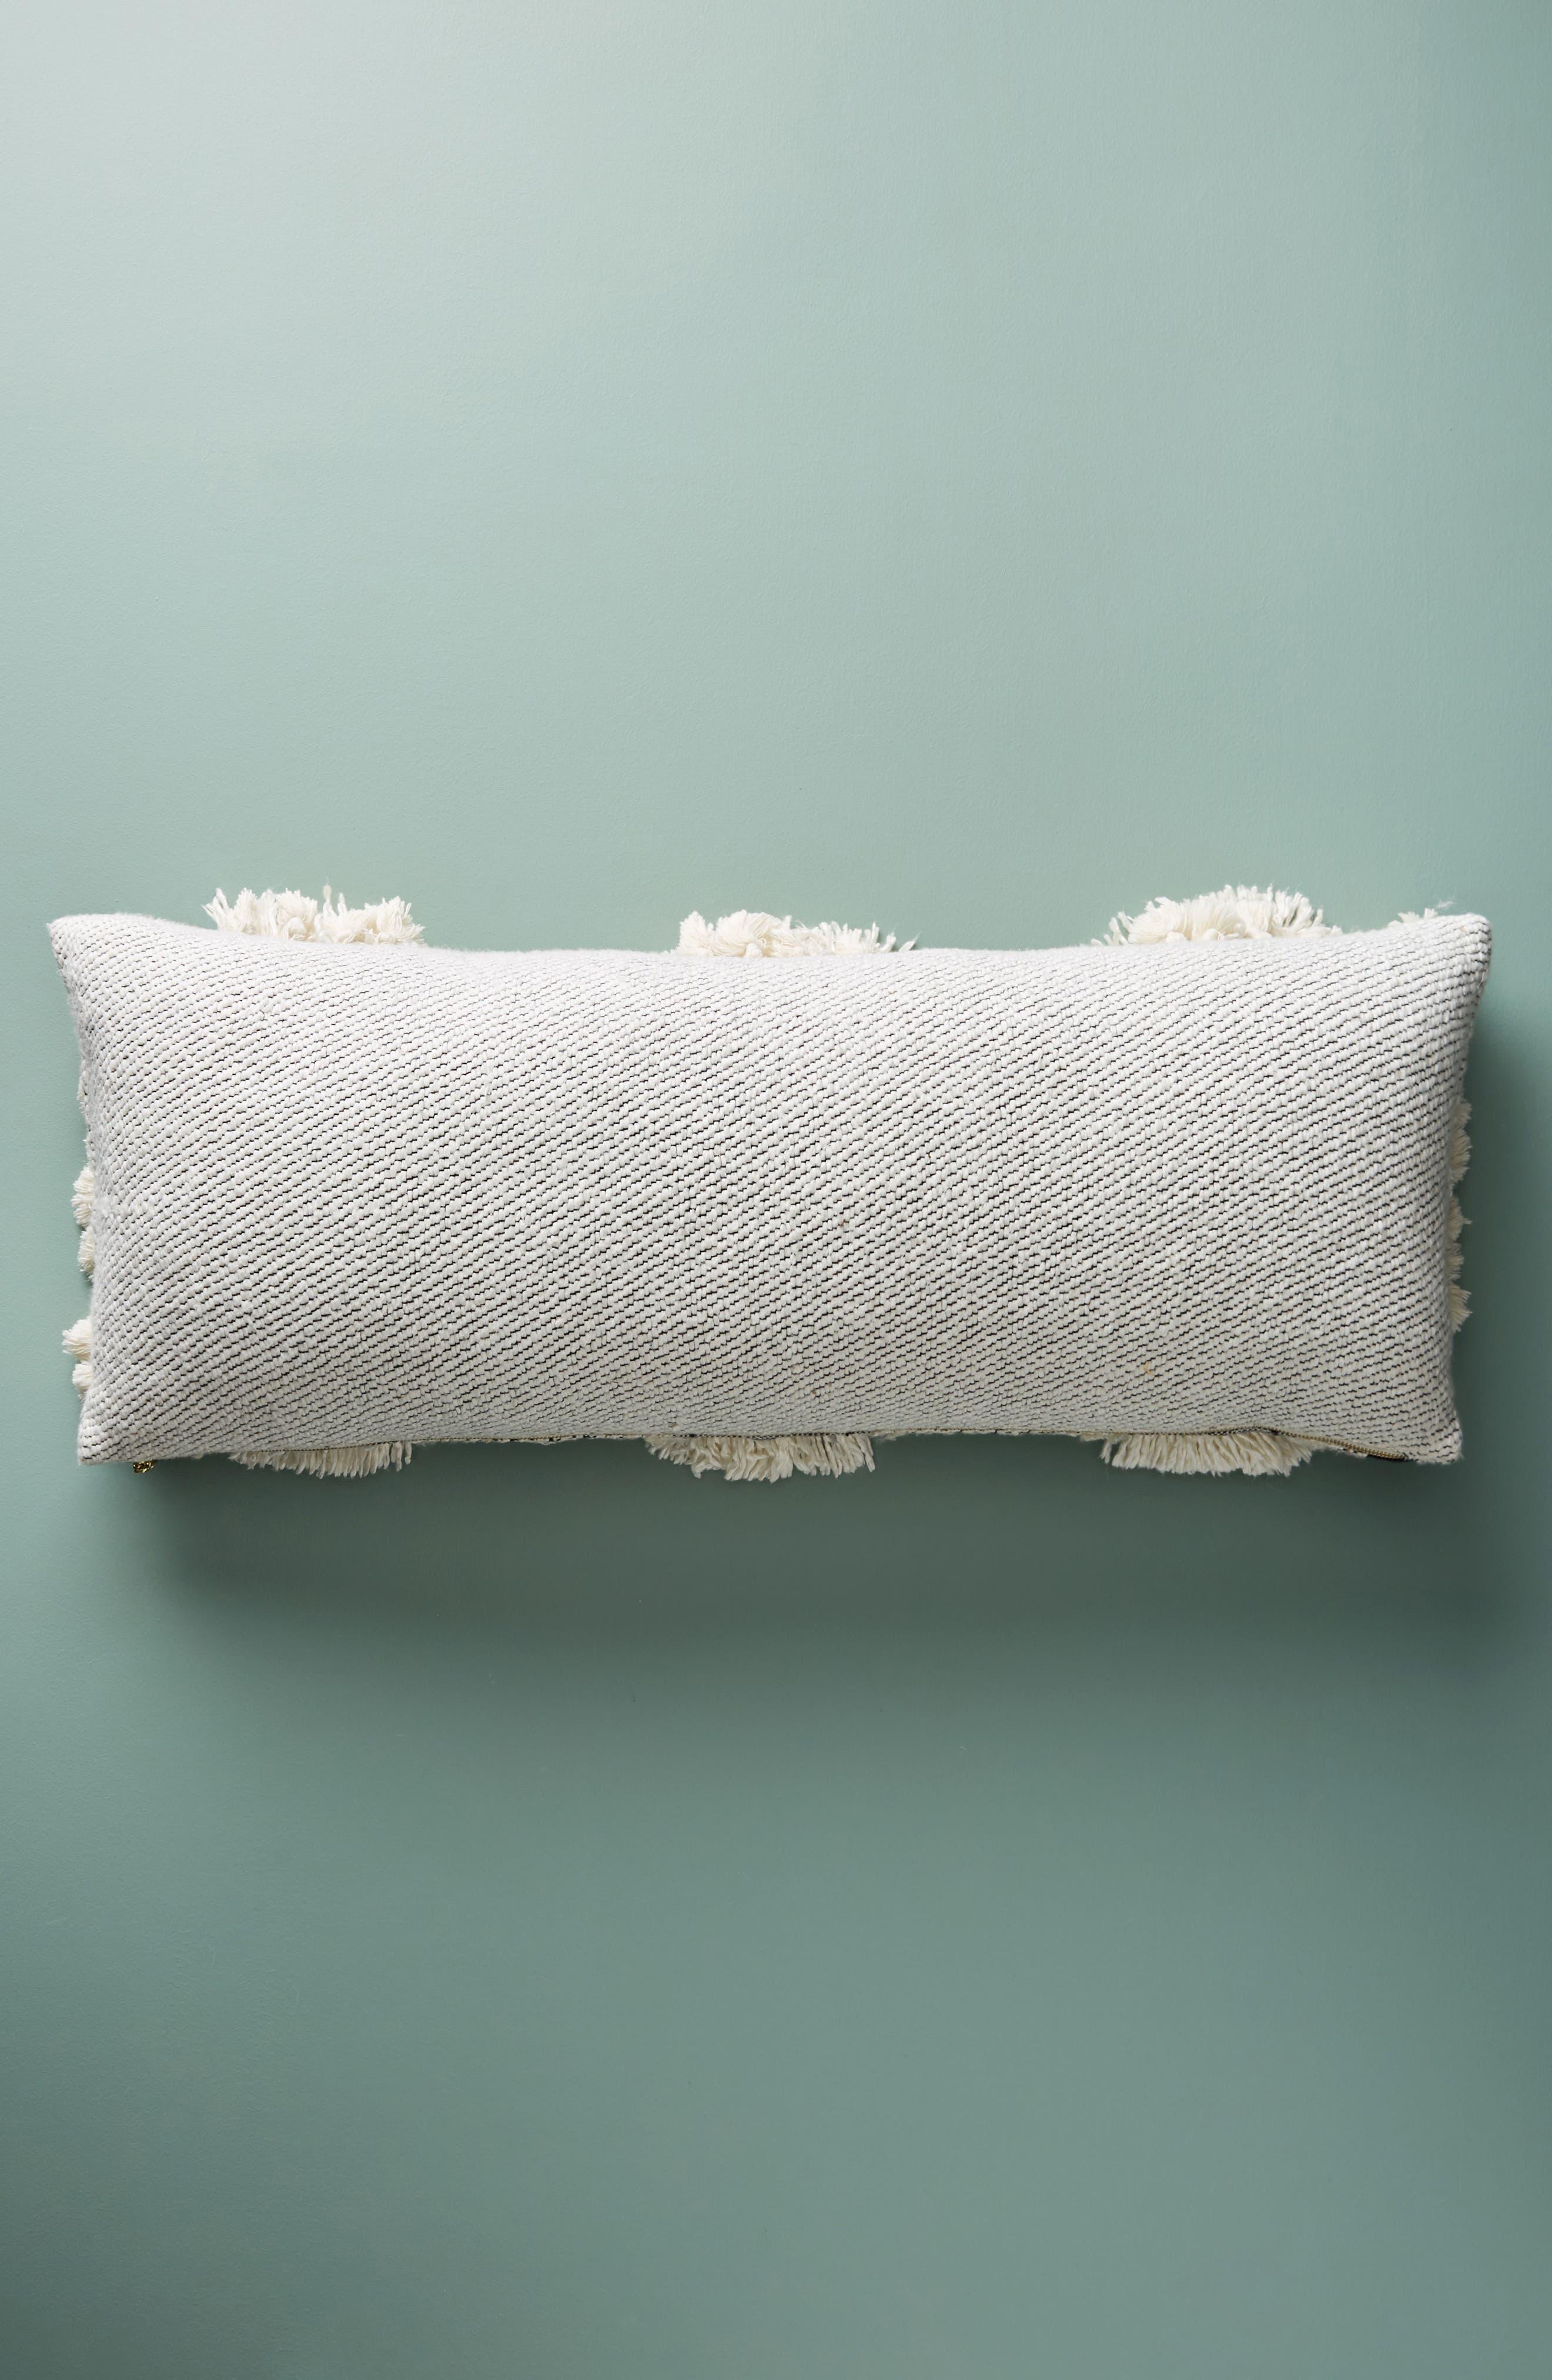 Edna Woven Accent Pillow,                             Alternate thumbnail 2, color,                             Black/ White Combo